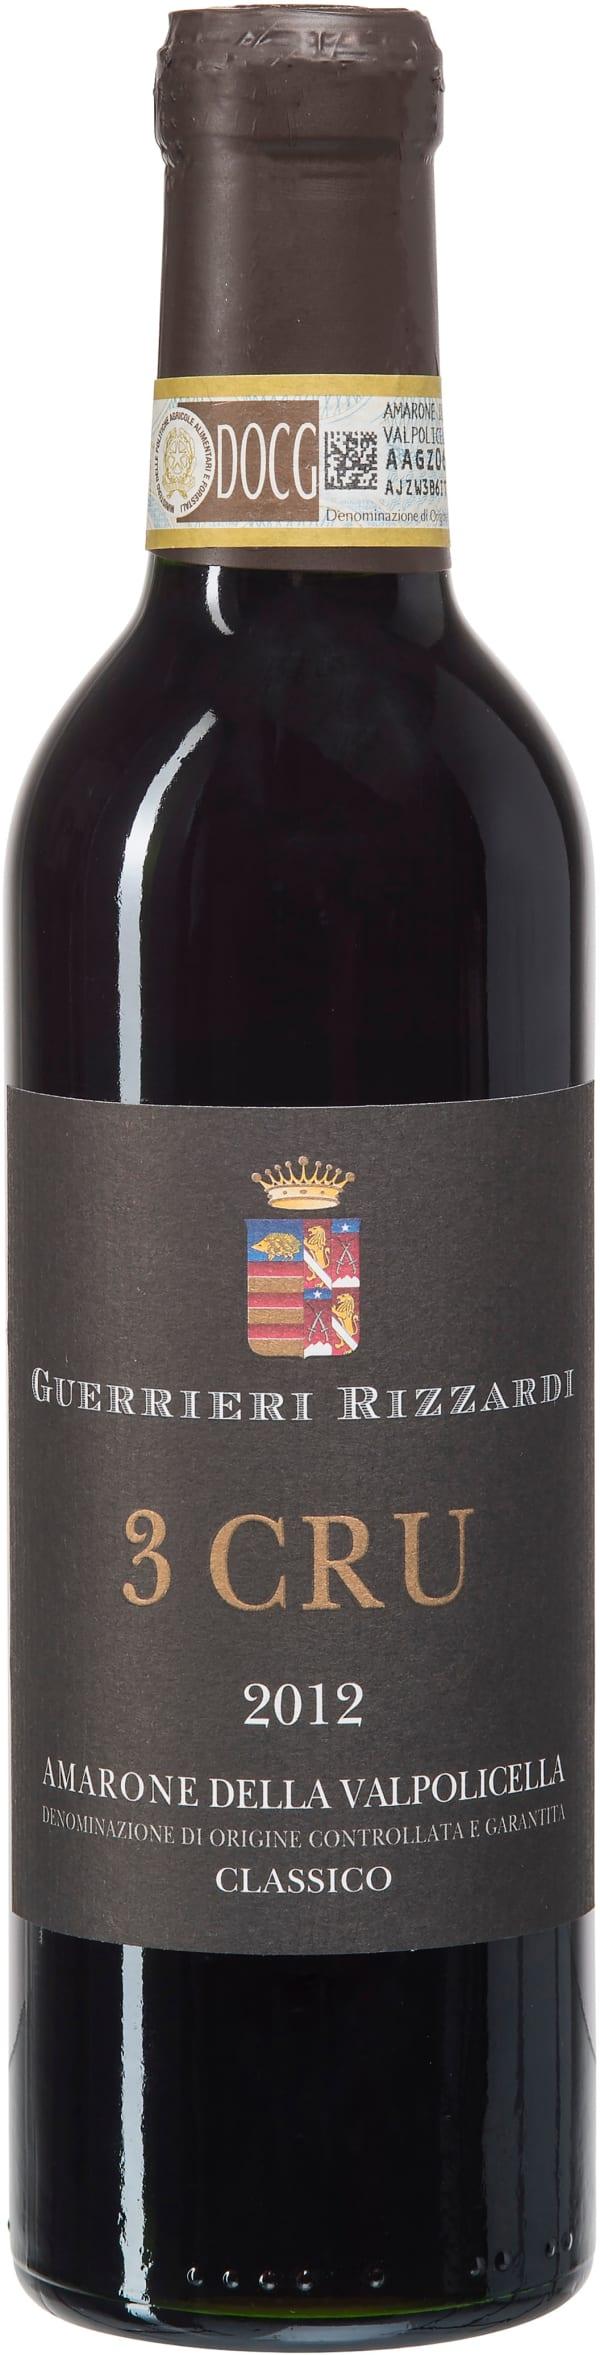 Guerrieri Rizzardi 3 Cru Amarone Classico 2012